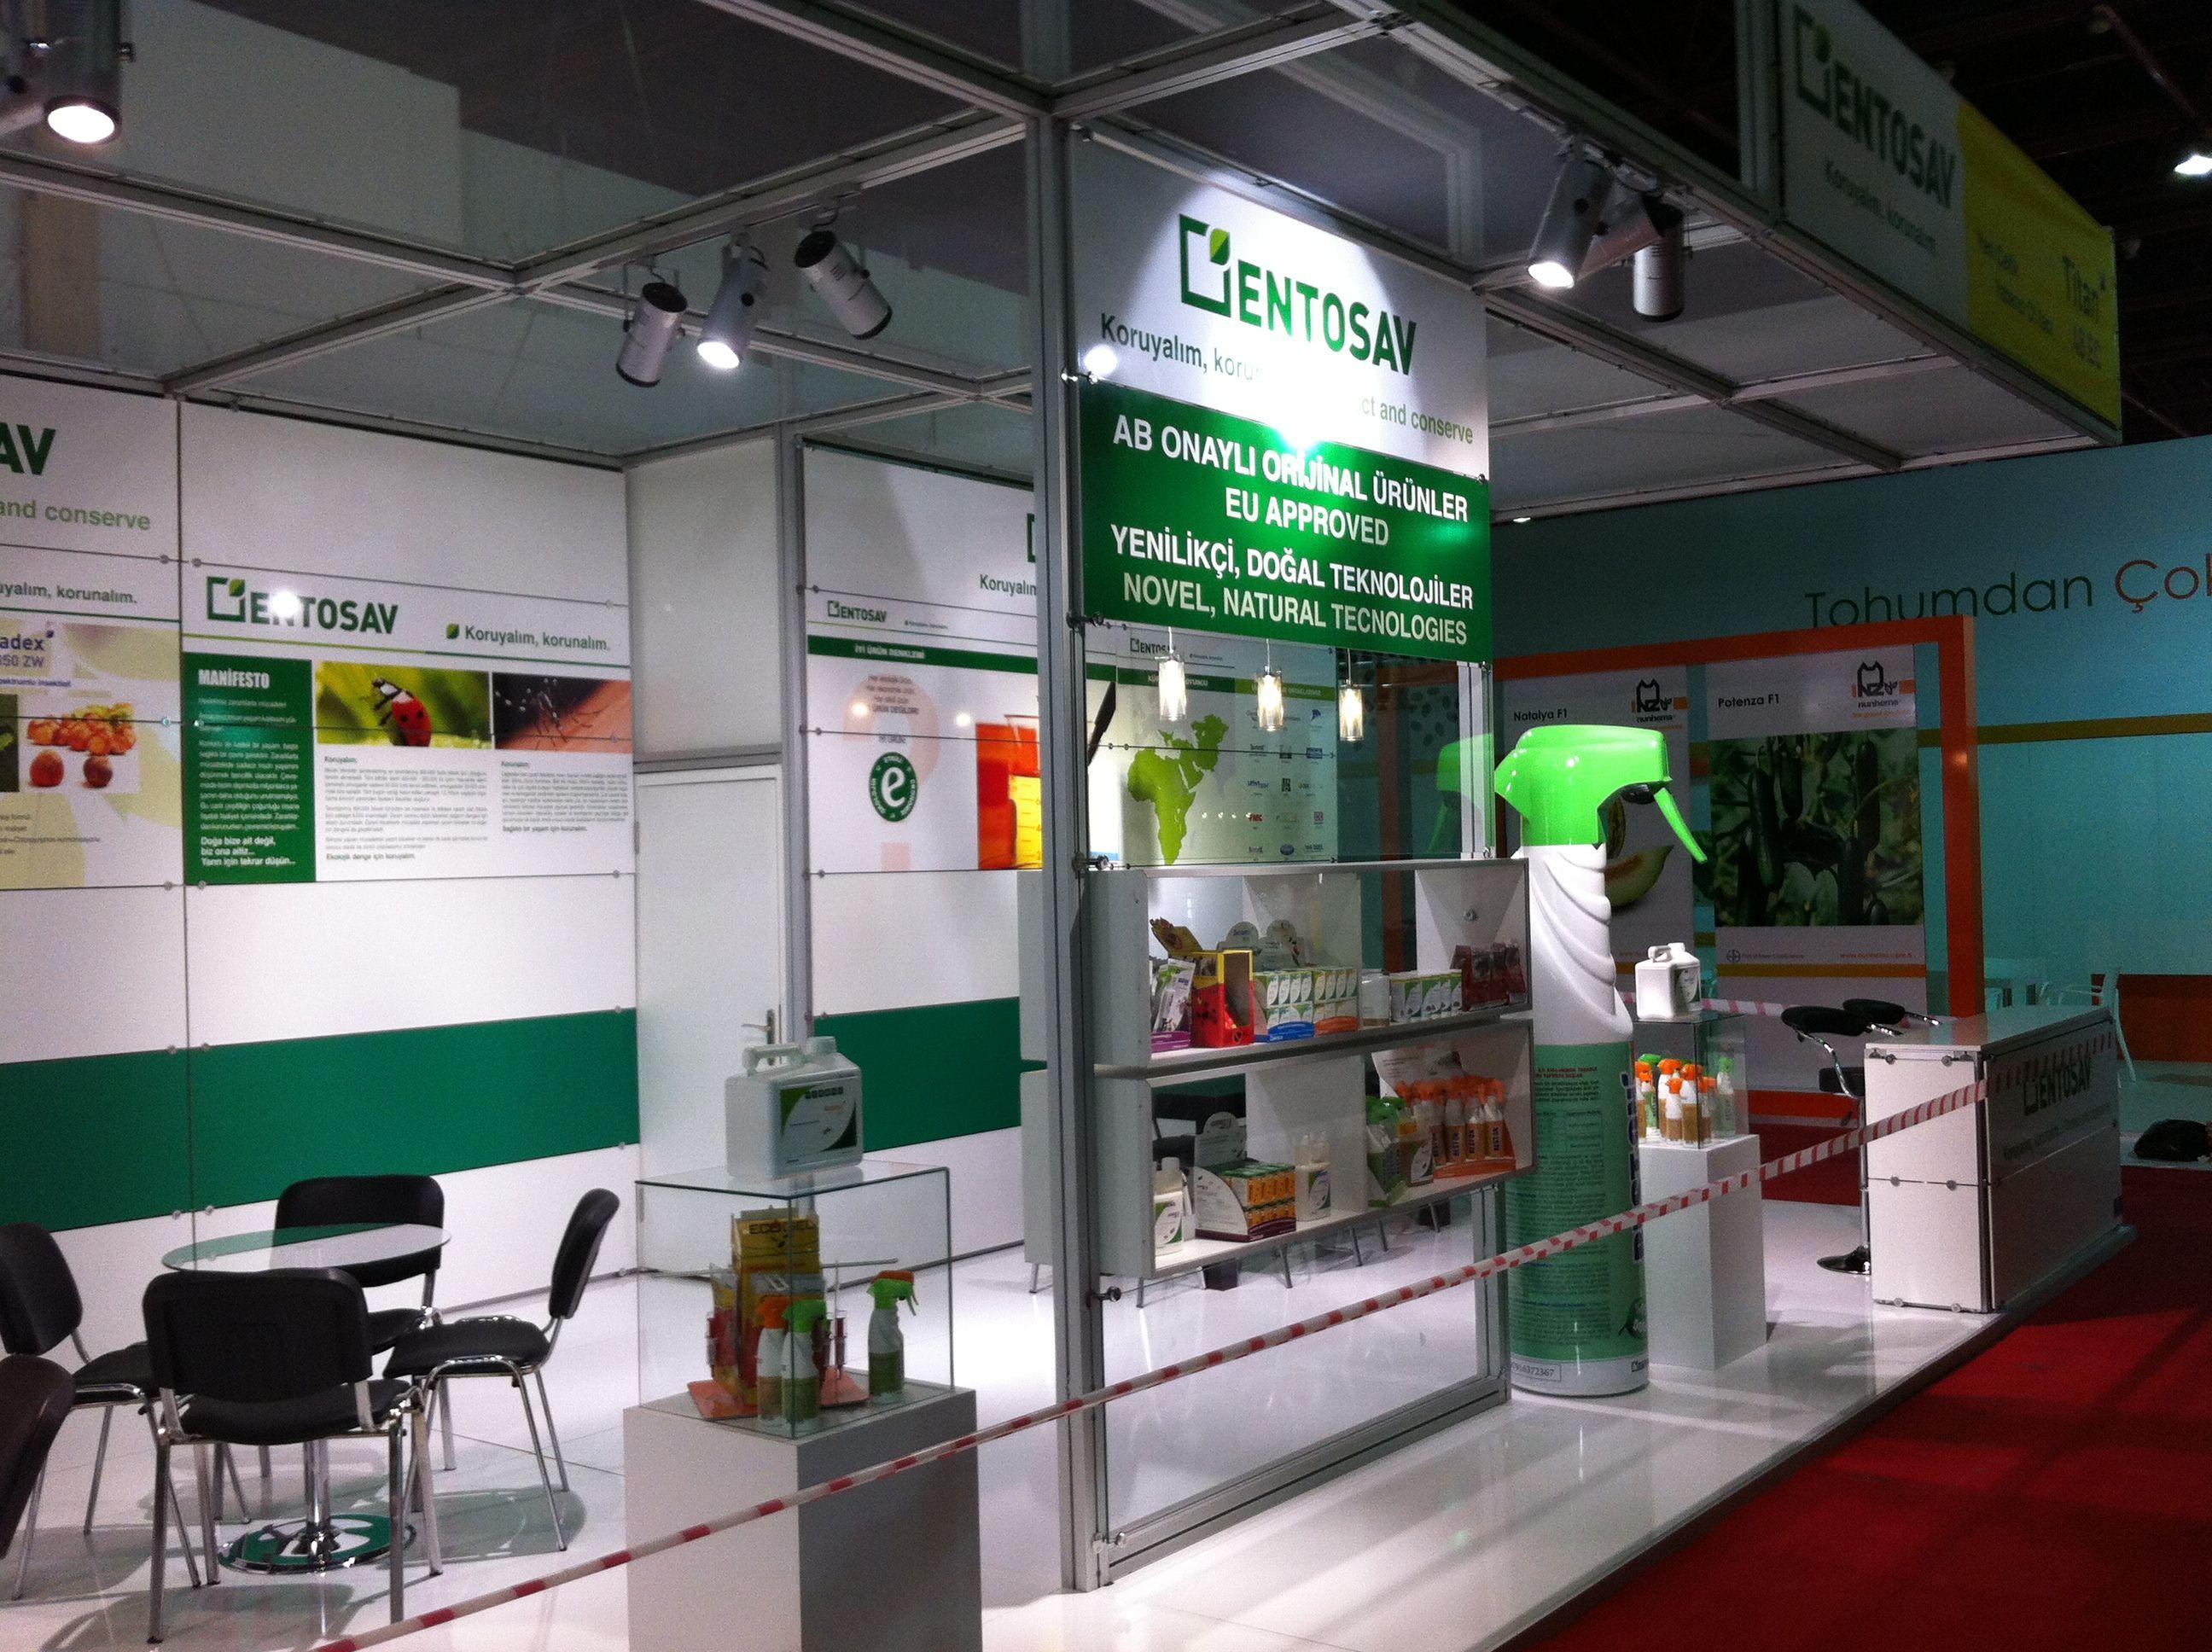 Exhibition Stand Design Proposal : Fa architecture design congress and exhibition stand